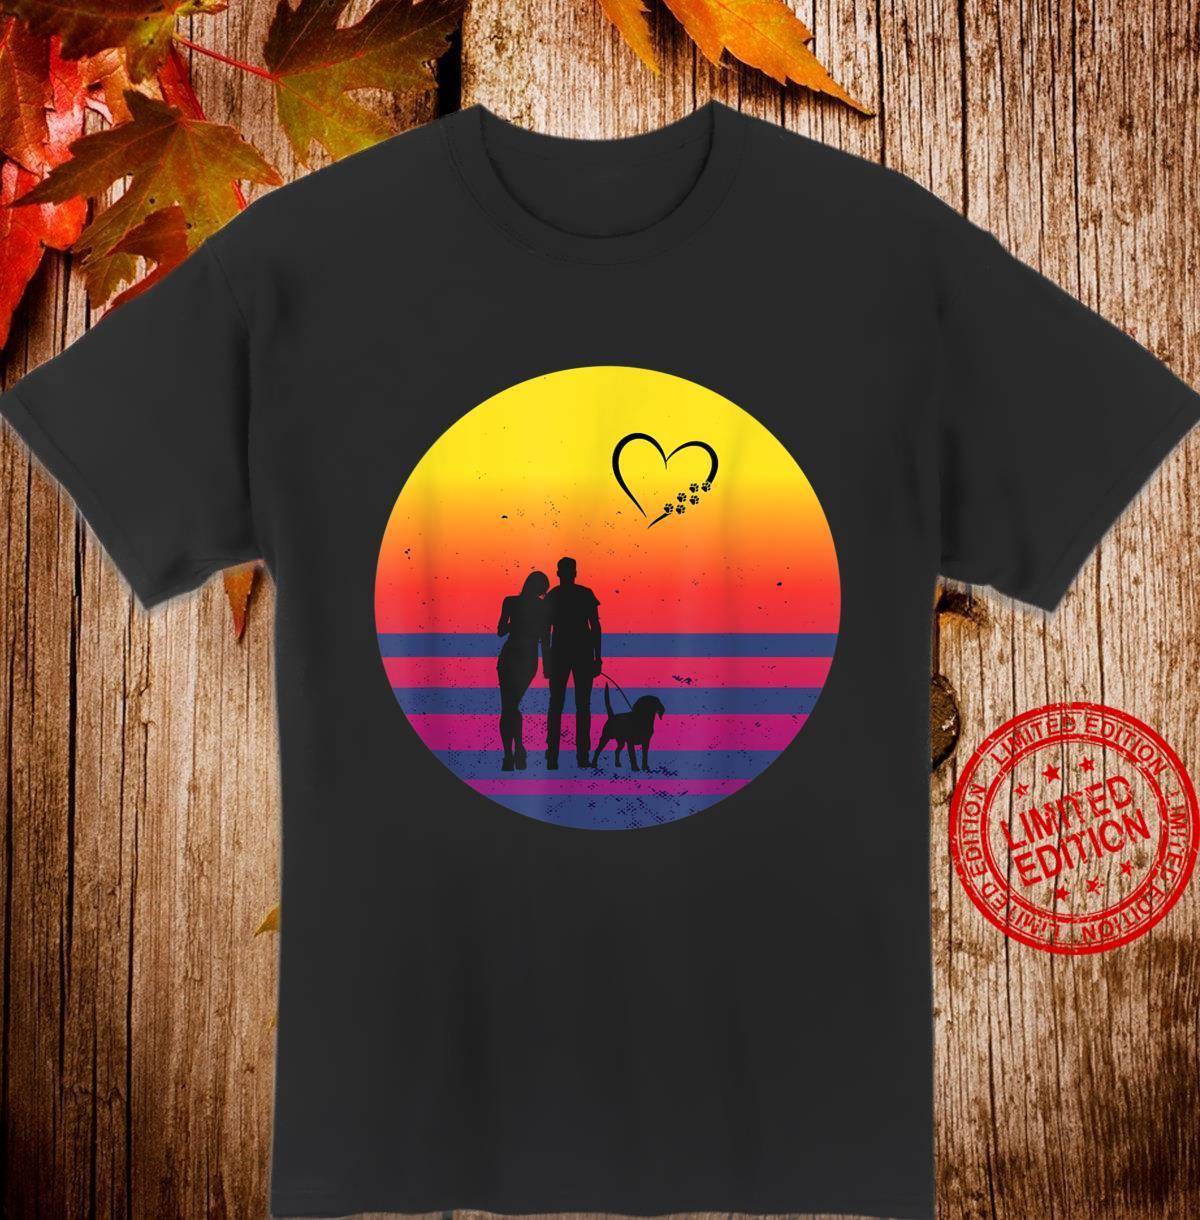 Sonnenuntergang Paar mit Hund Shirt